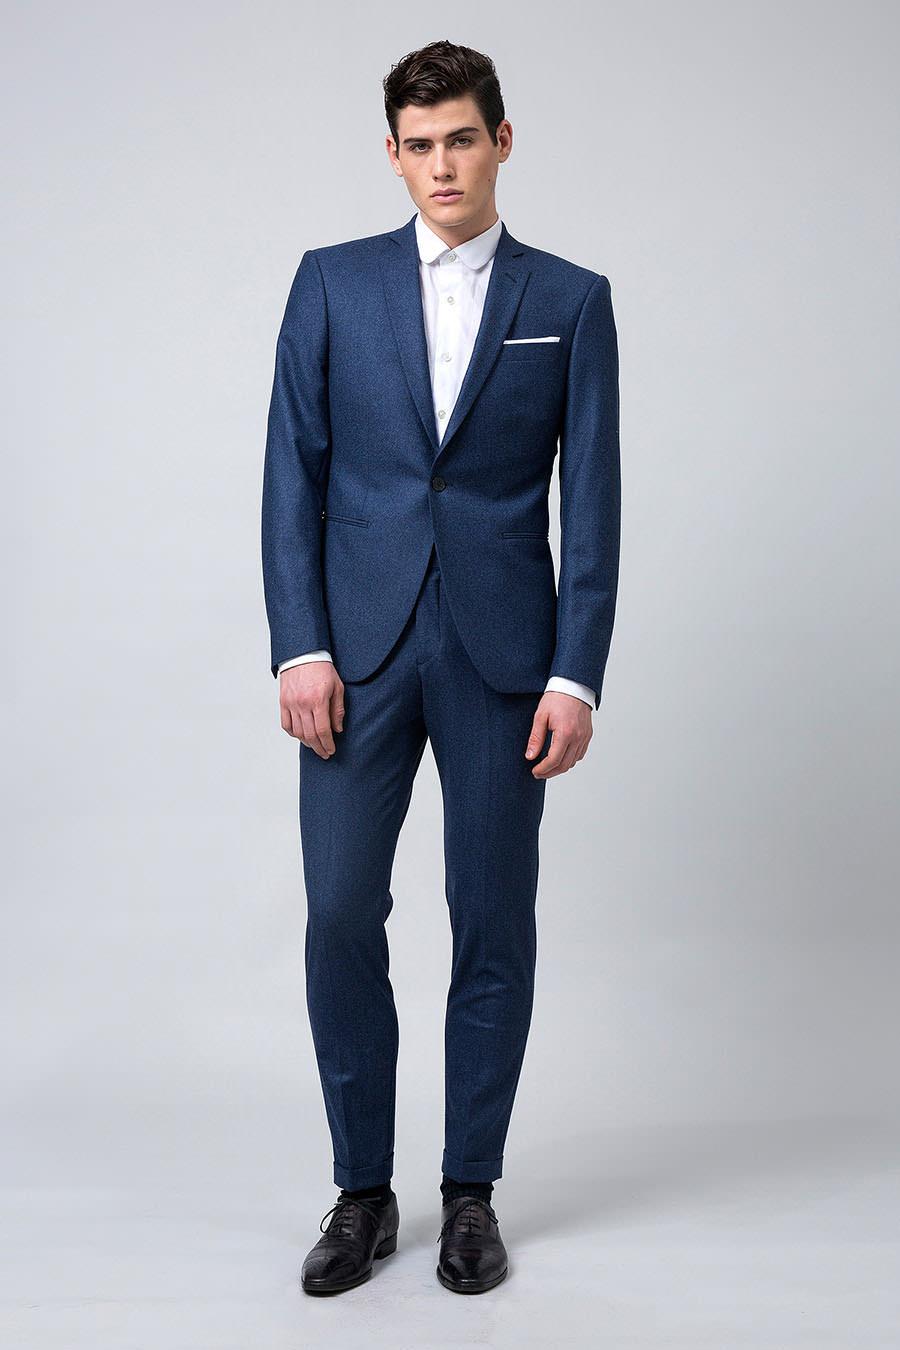 samonsurmesureH16 costume bleu-2